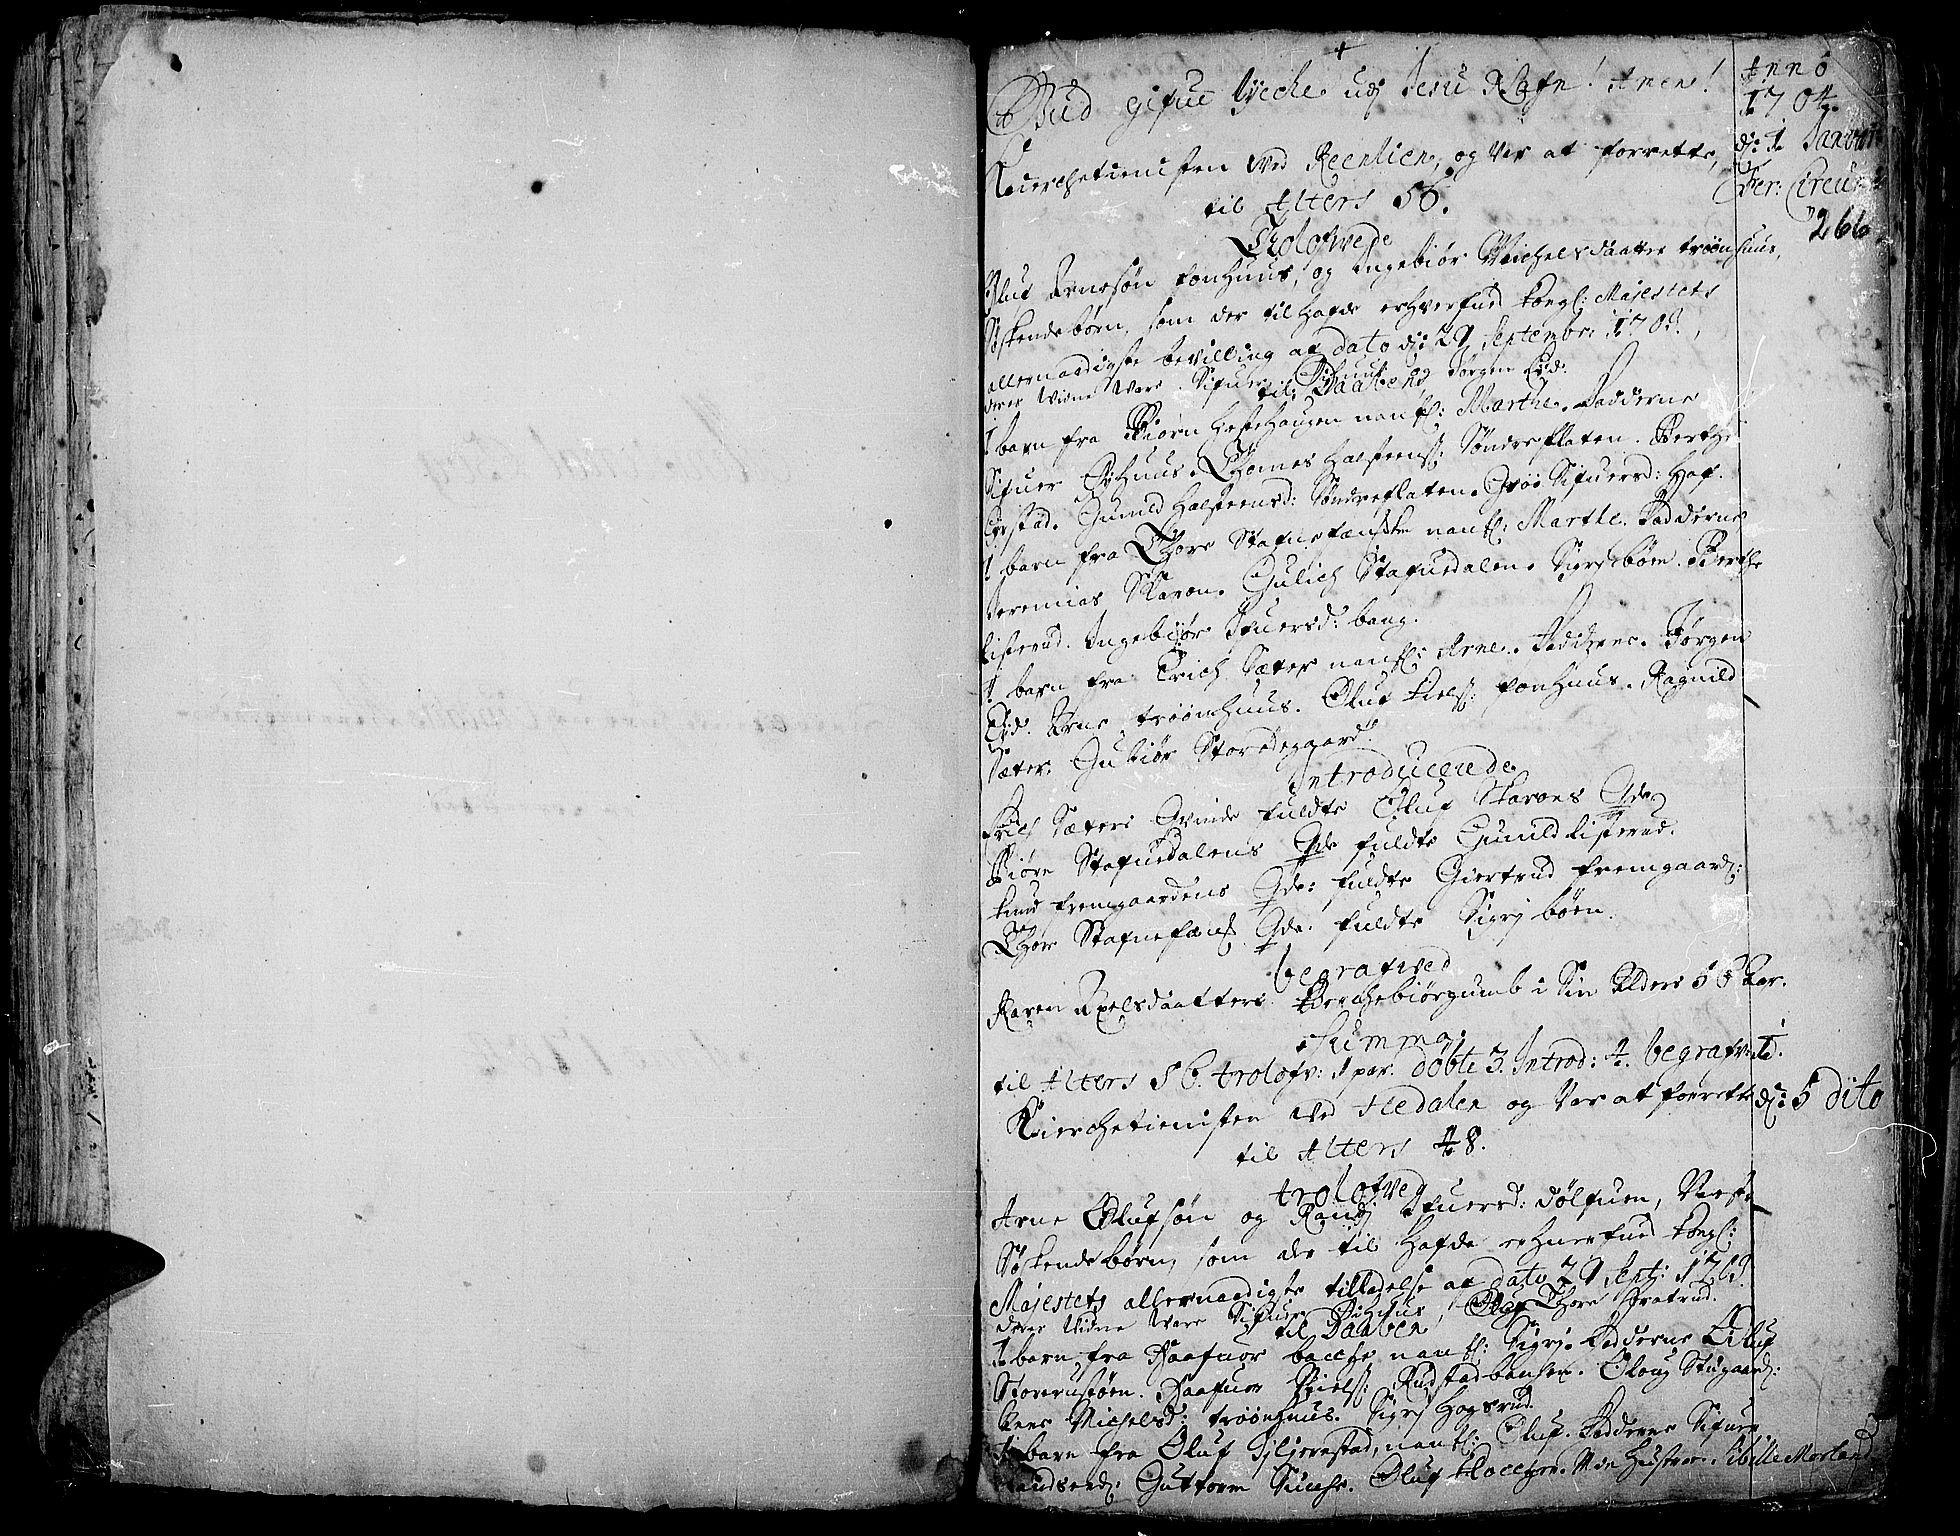 SAH, Aurdal prestekontor, Ministerialbok nr. 1-3, 1692-1730, s. 266